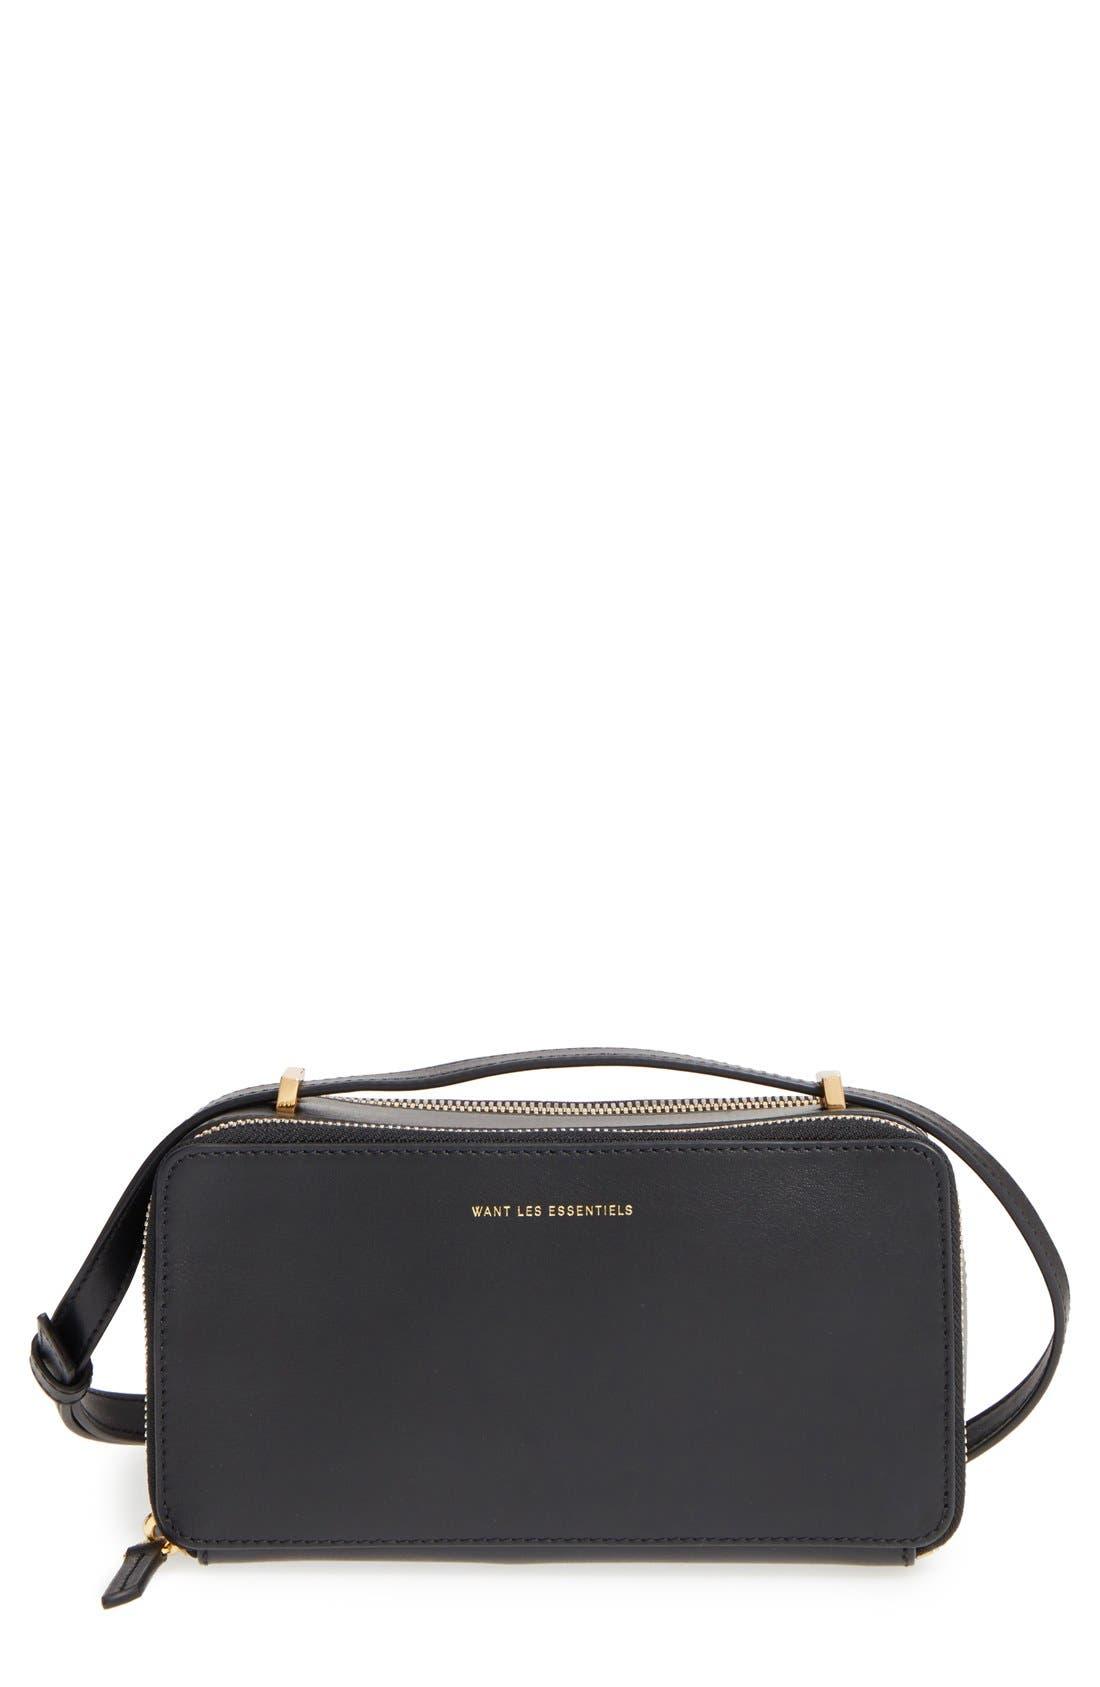 WANT LES ESSENTIELS,                             'Demiranda' Leather Shoulder Bag,                             Main thumbnail 1, color,                             001